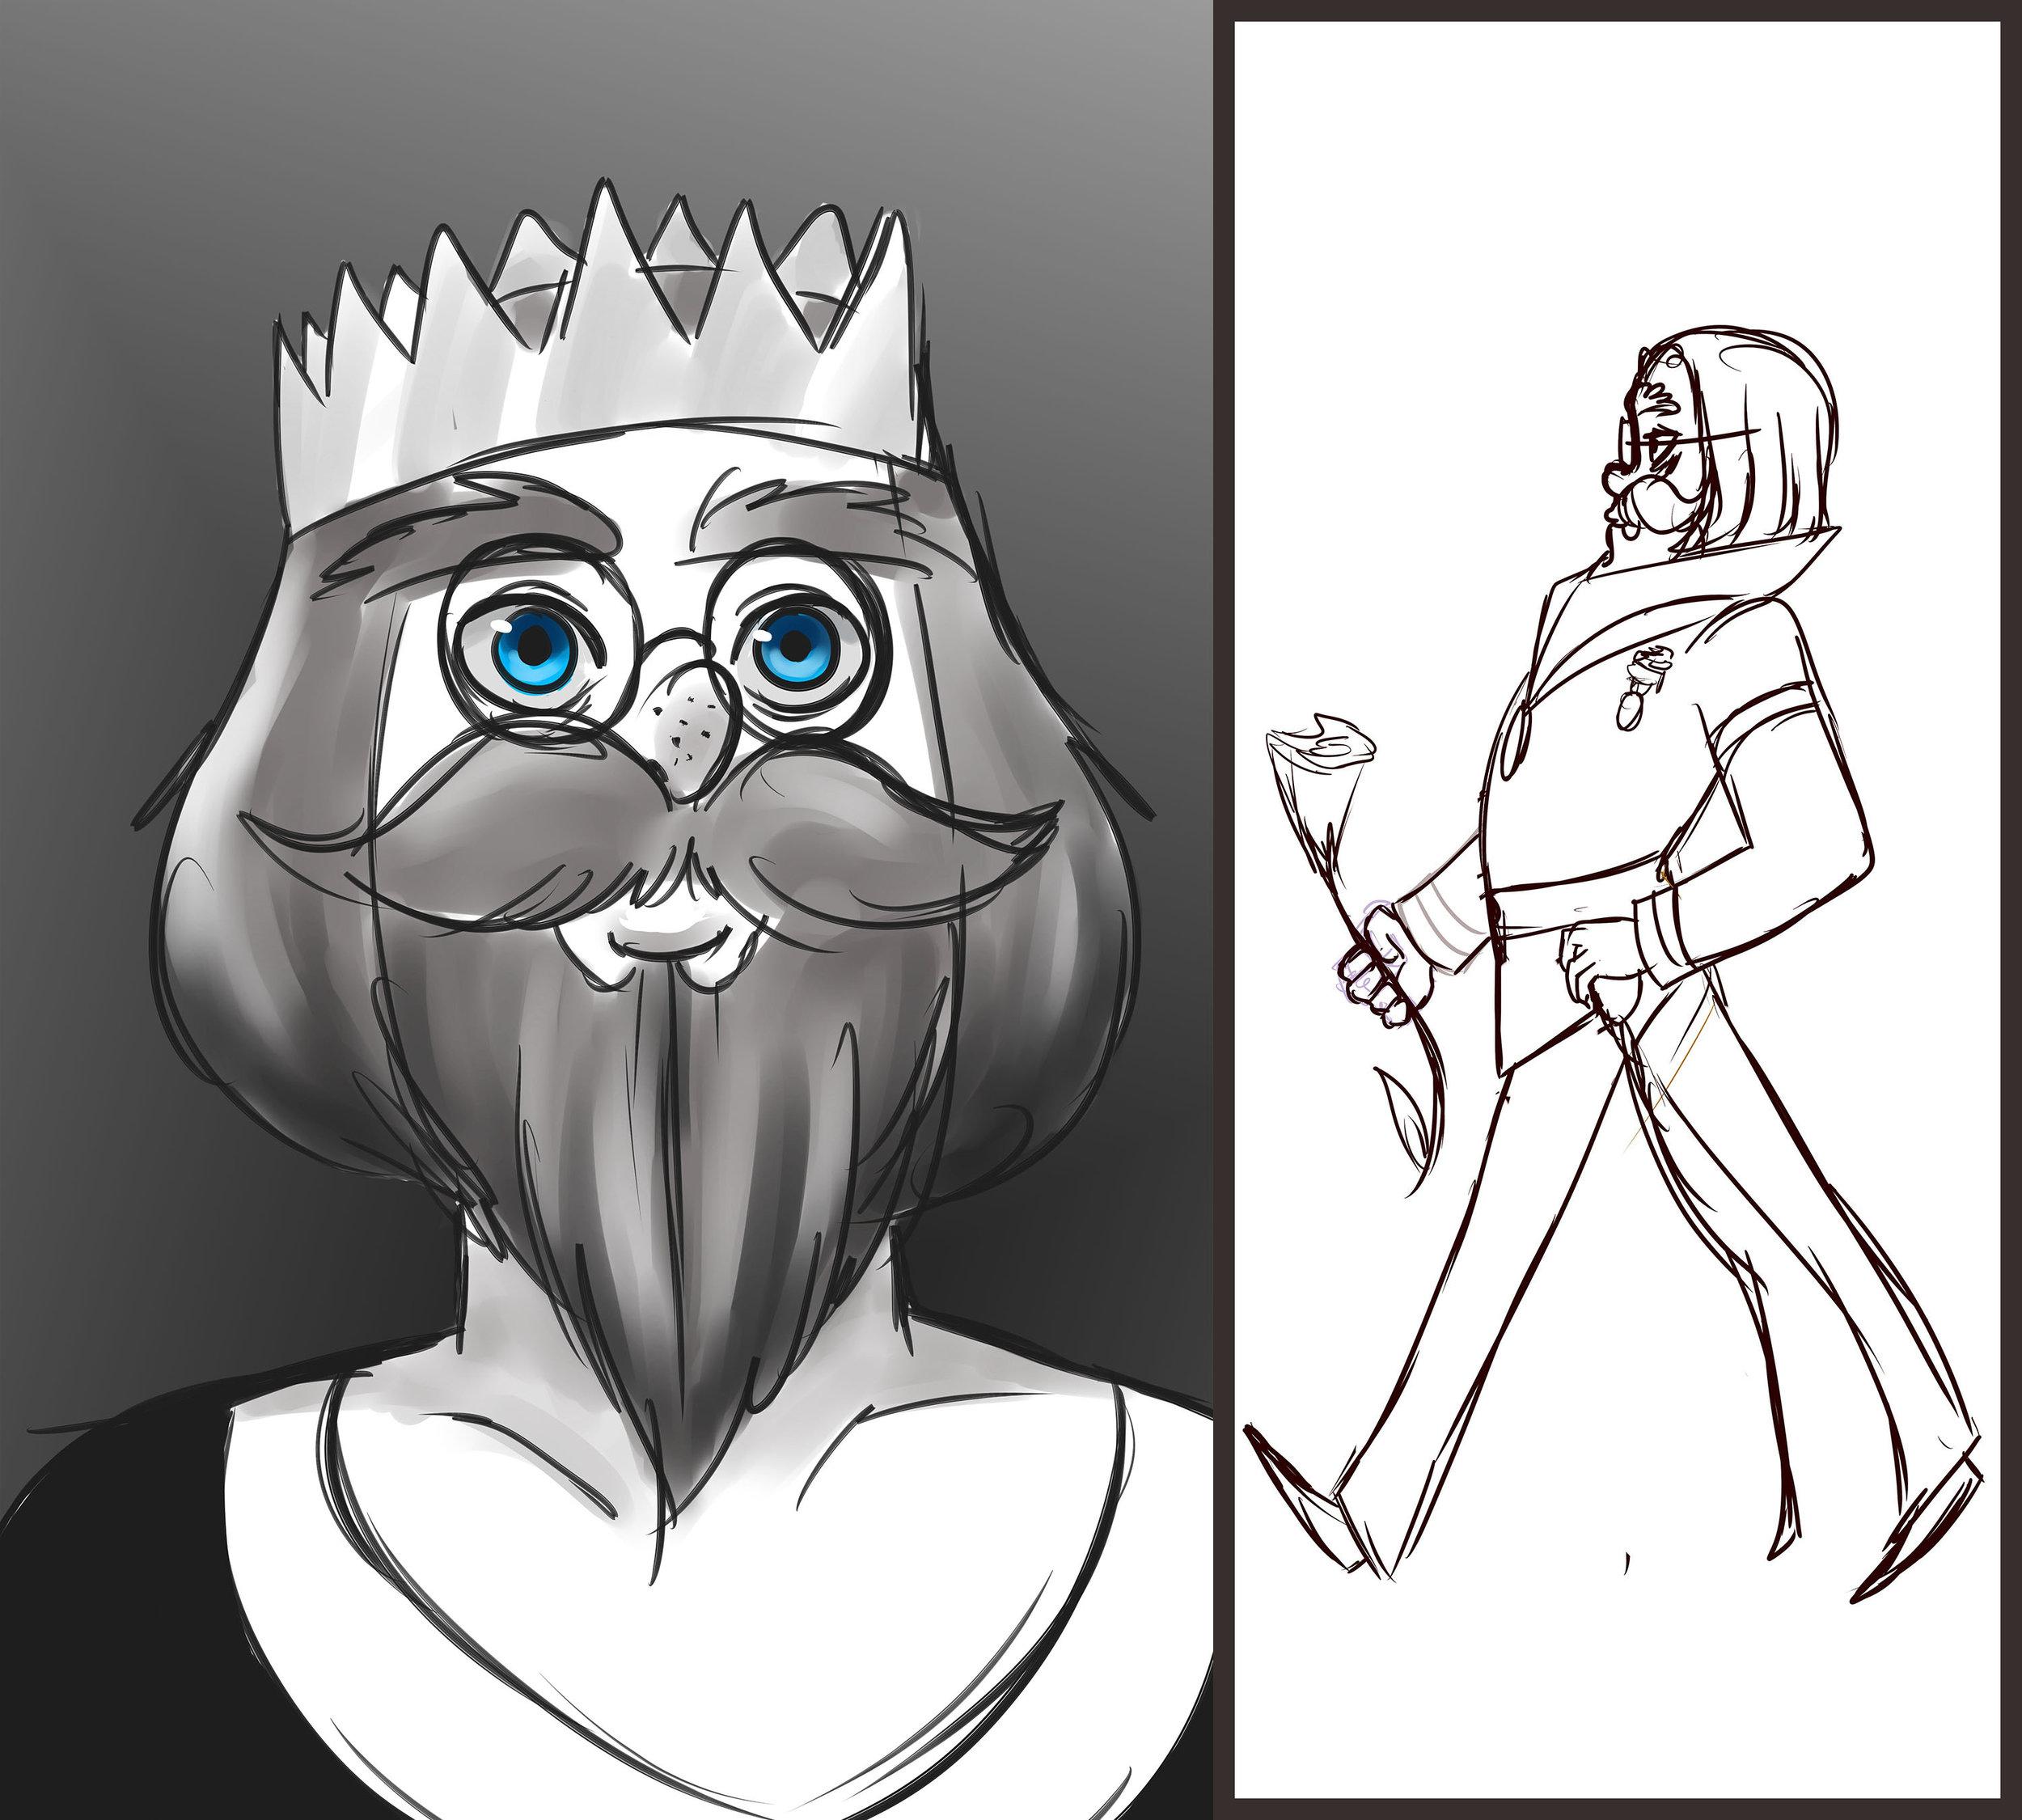 king-02.jpg